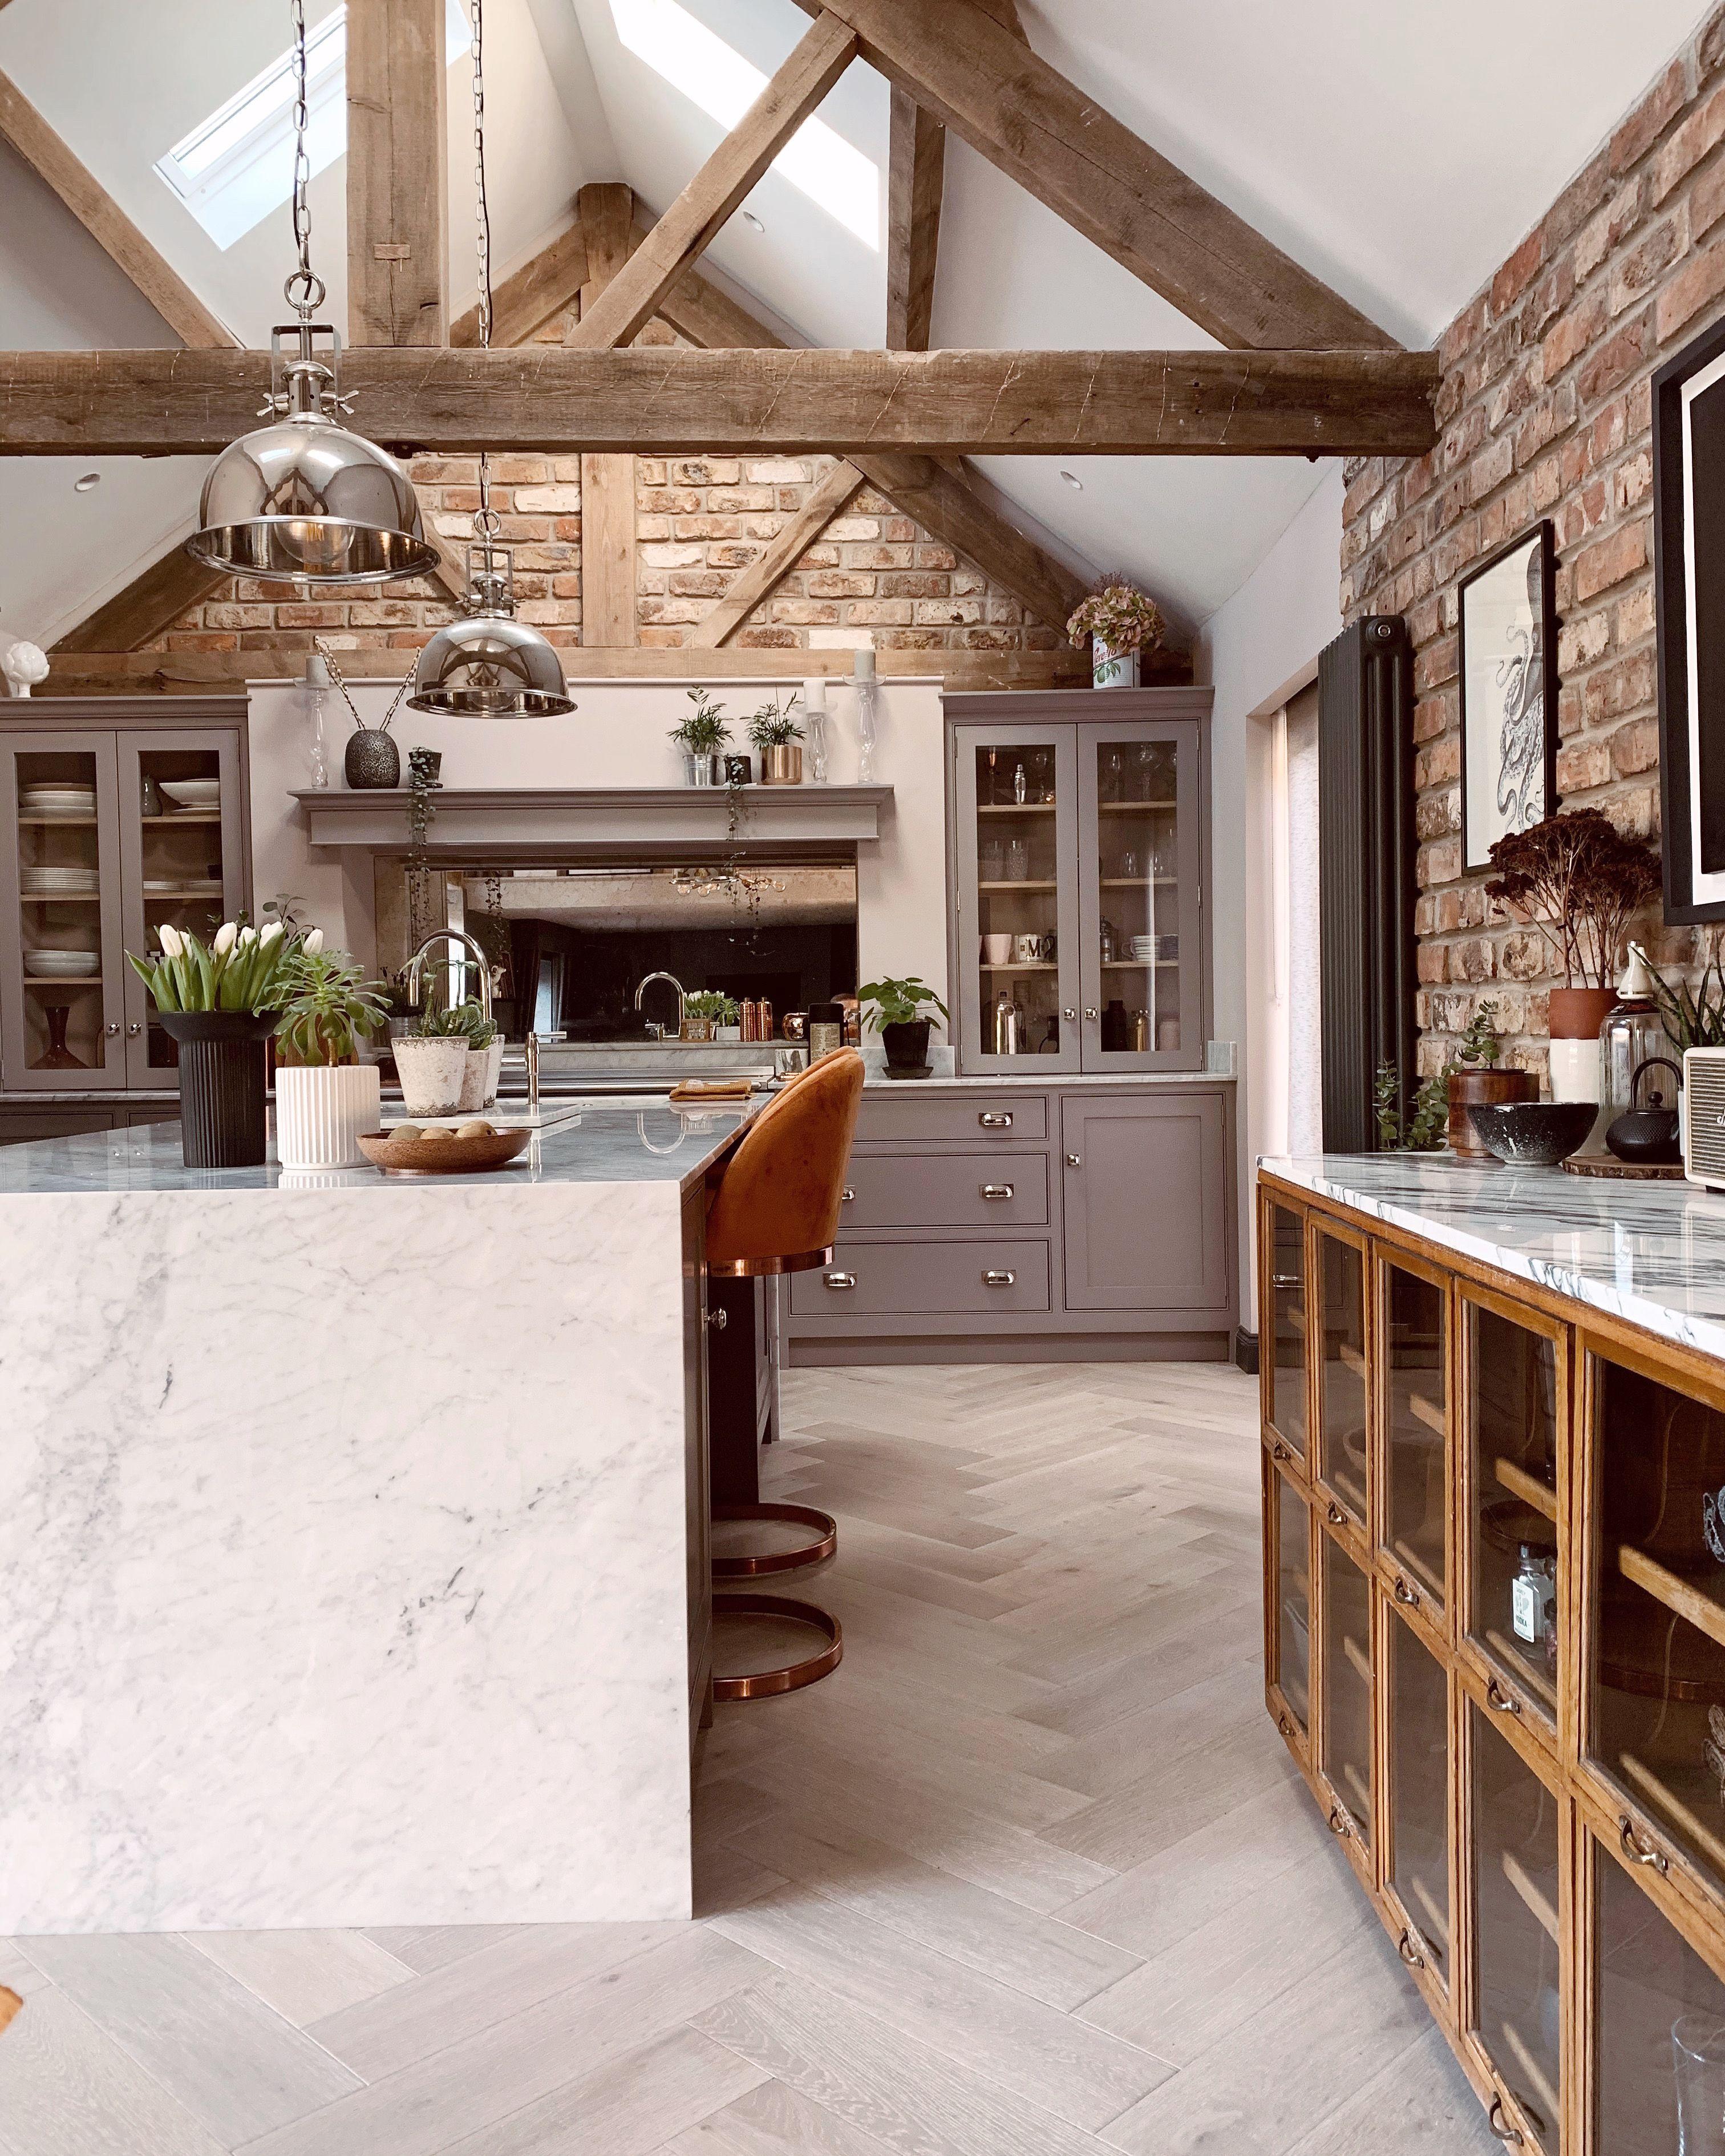 Kitchen Ideas Inspo Grey Kitchen Barn Conversion Barn Conversion Interiors Barn Conversion Barn Conversion Kitchen